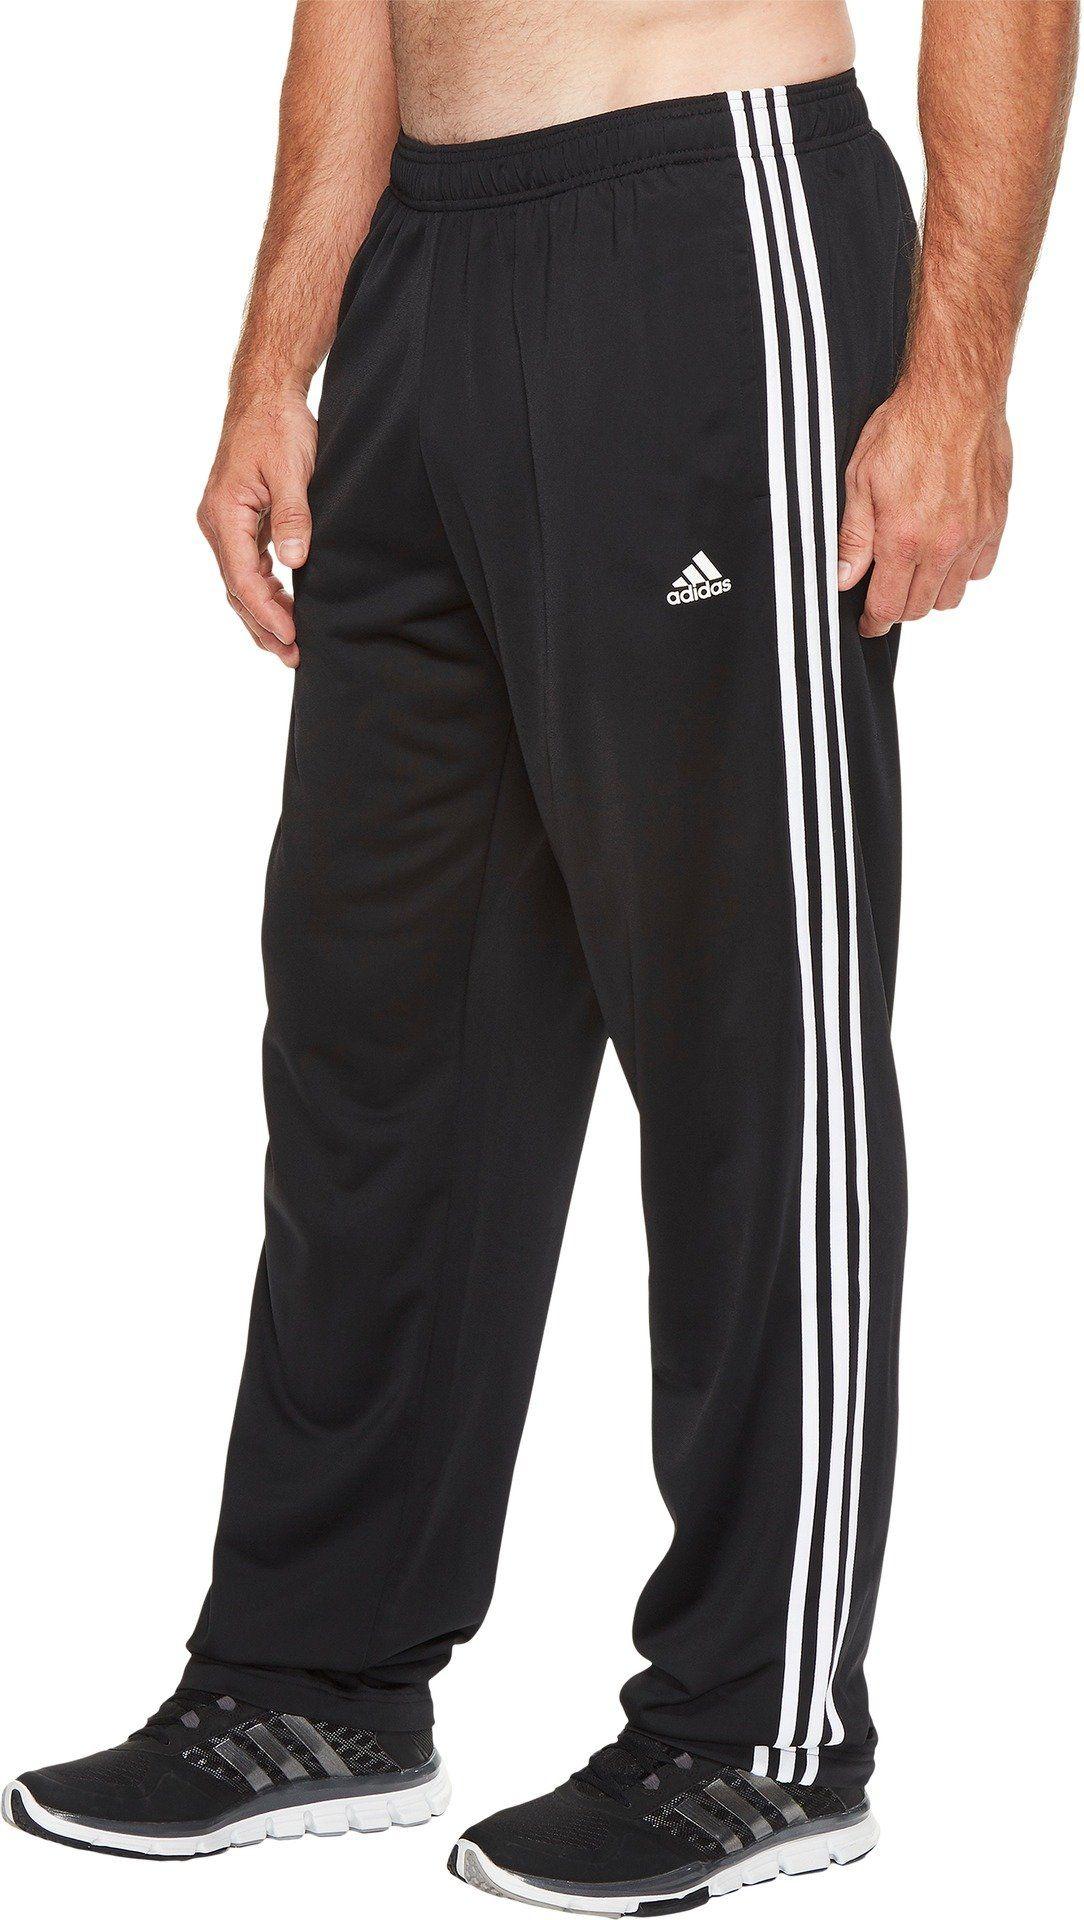 adidas Men's Big & Tall Essentails 3 Stripes Regular Fit